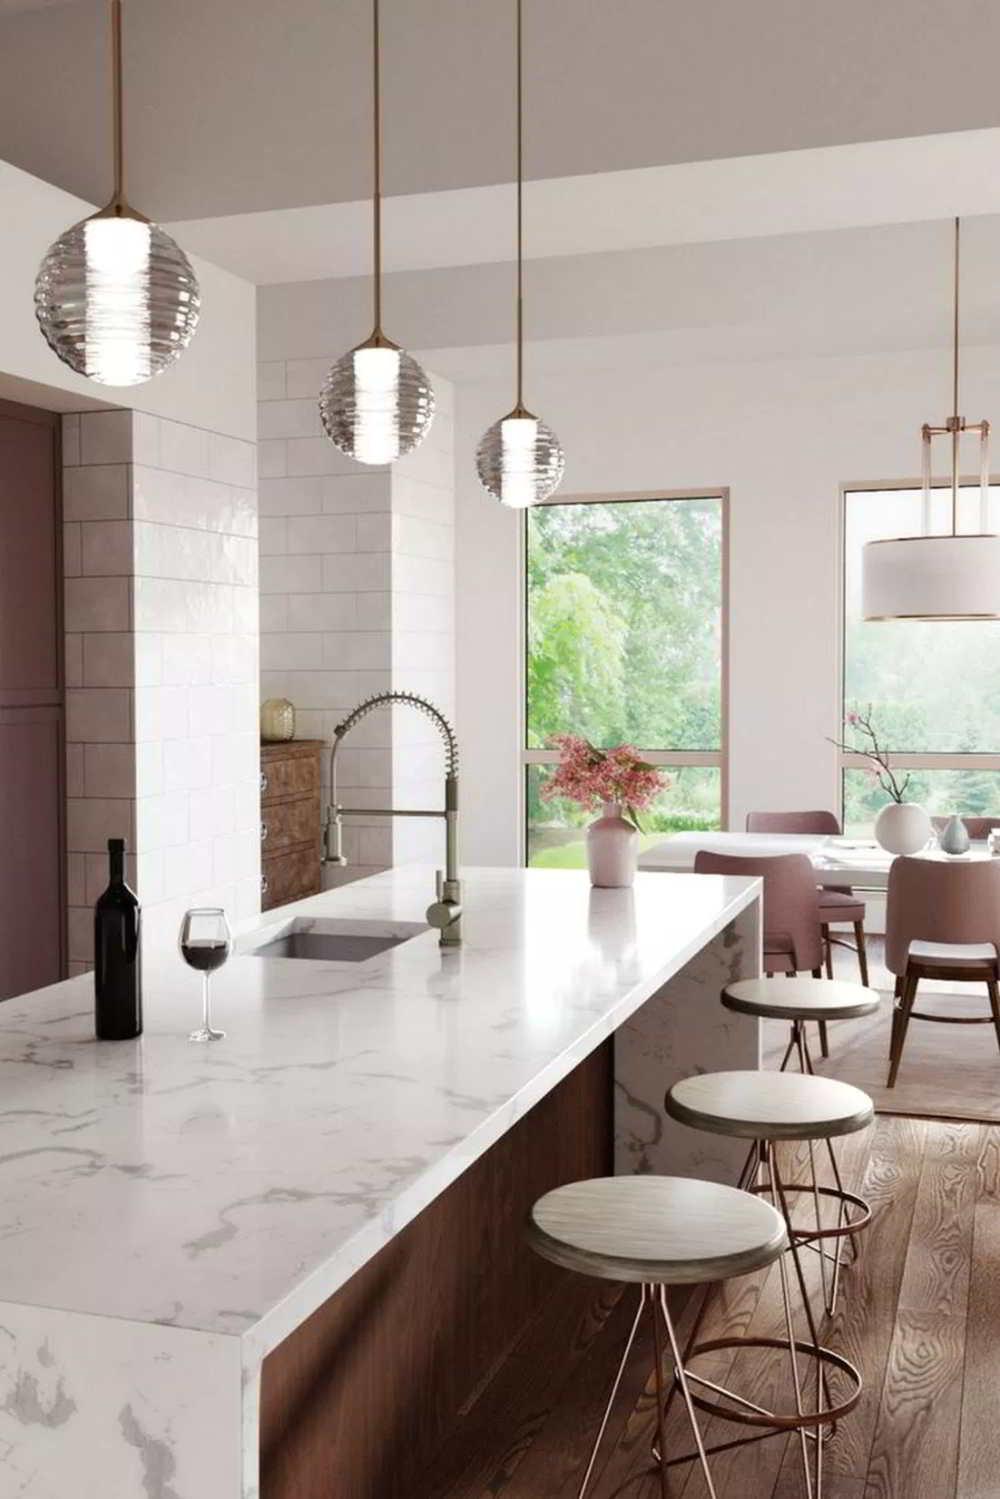 ilha de cozinha branca iluminada